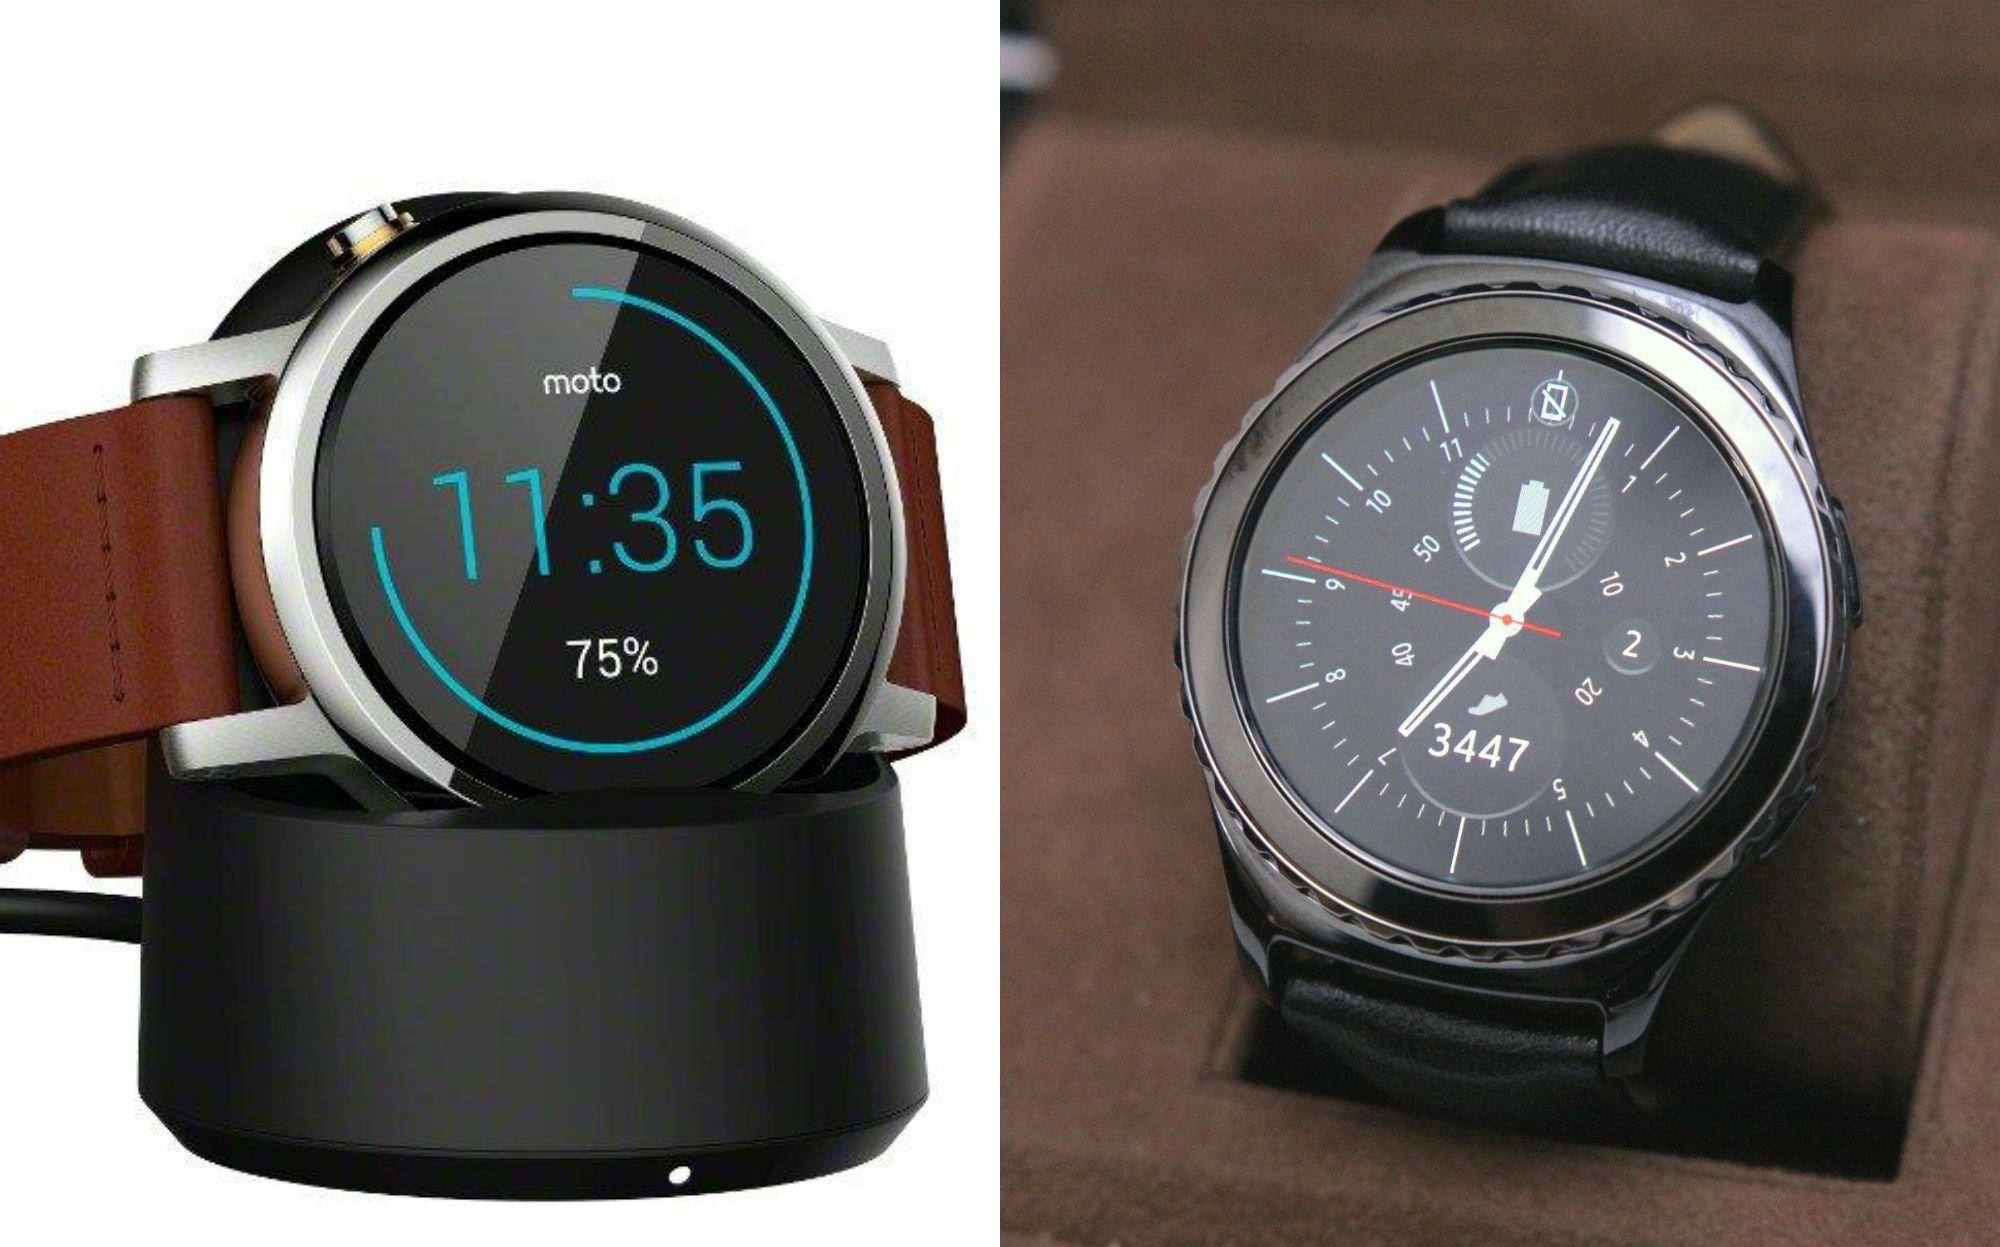 Motorola Moto 360 2015 Vs Samsung Gear S2 Comparison